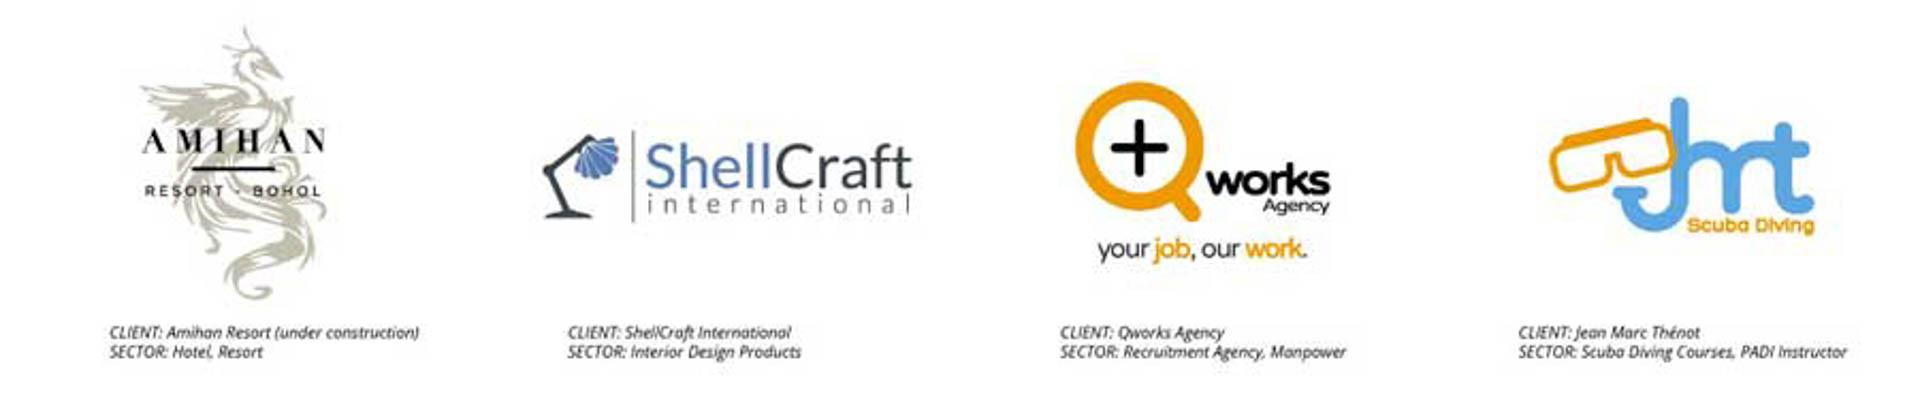 Logo to build brand identity